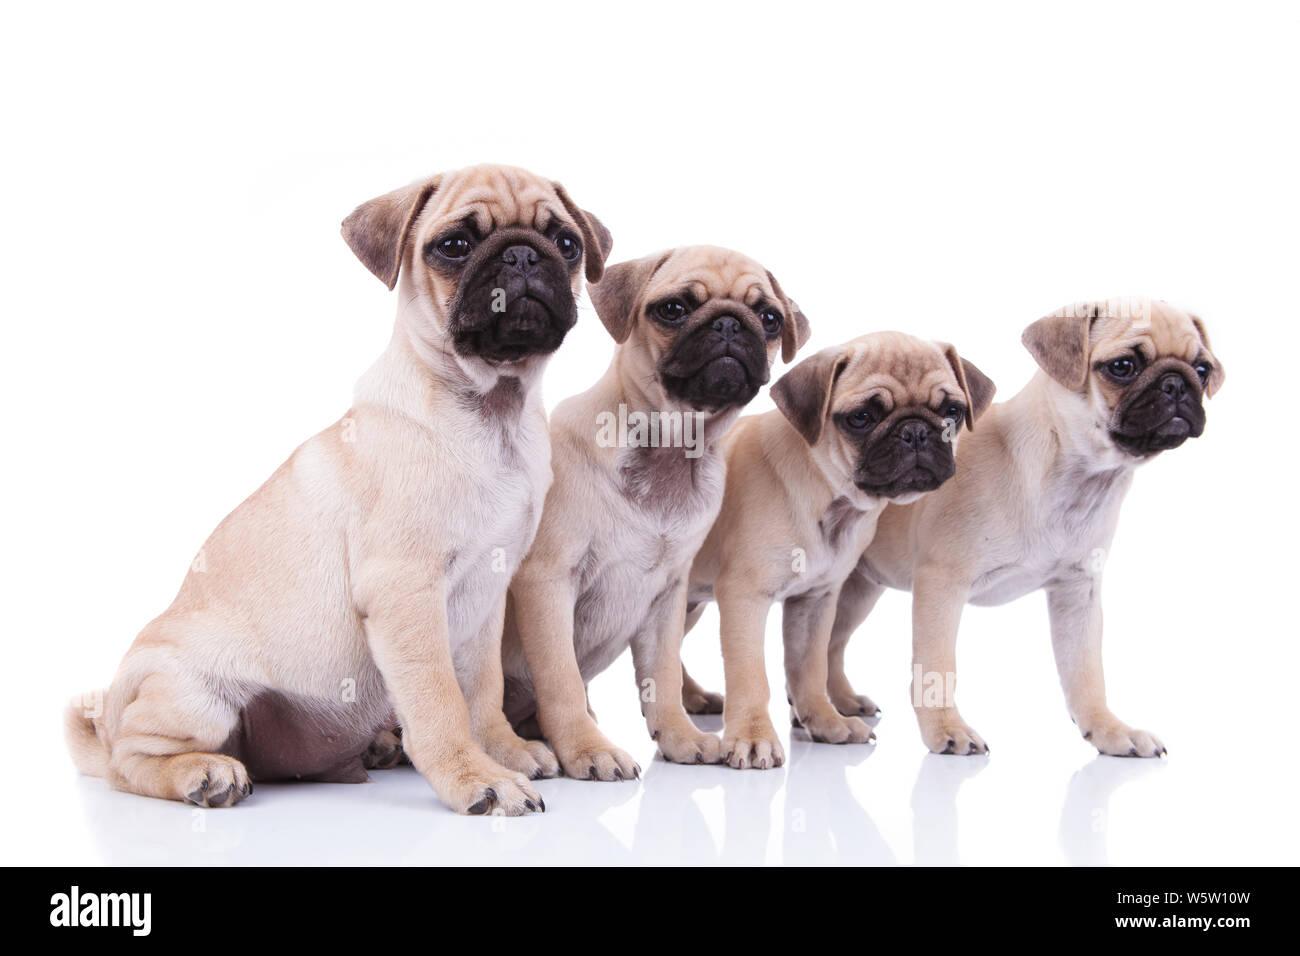 Pugs Group Stock Photos & Pugs Group Stock Images - Alamy